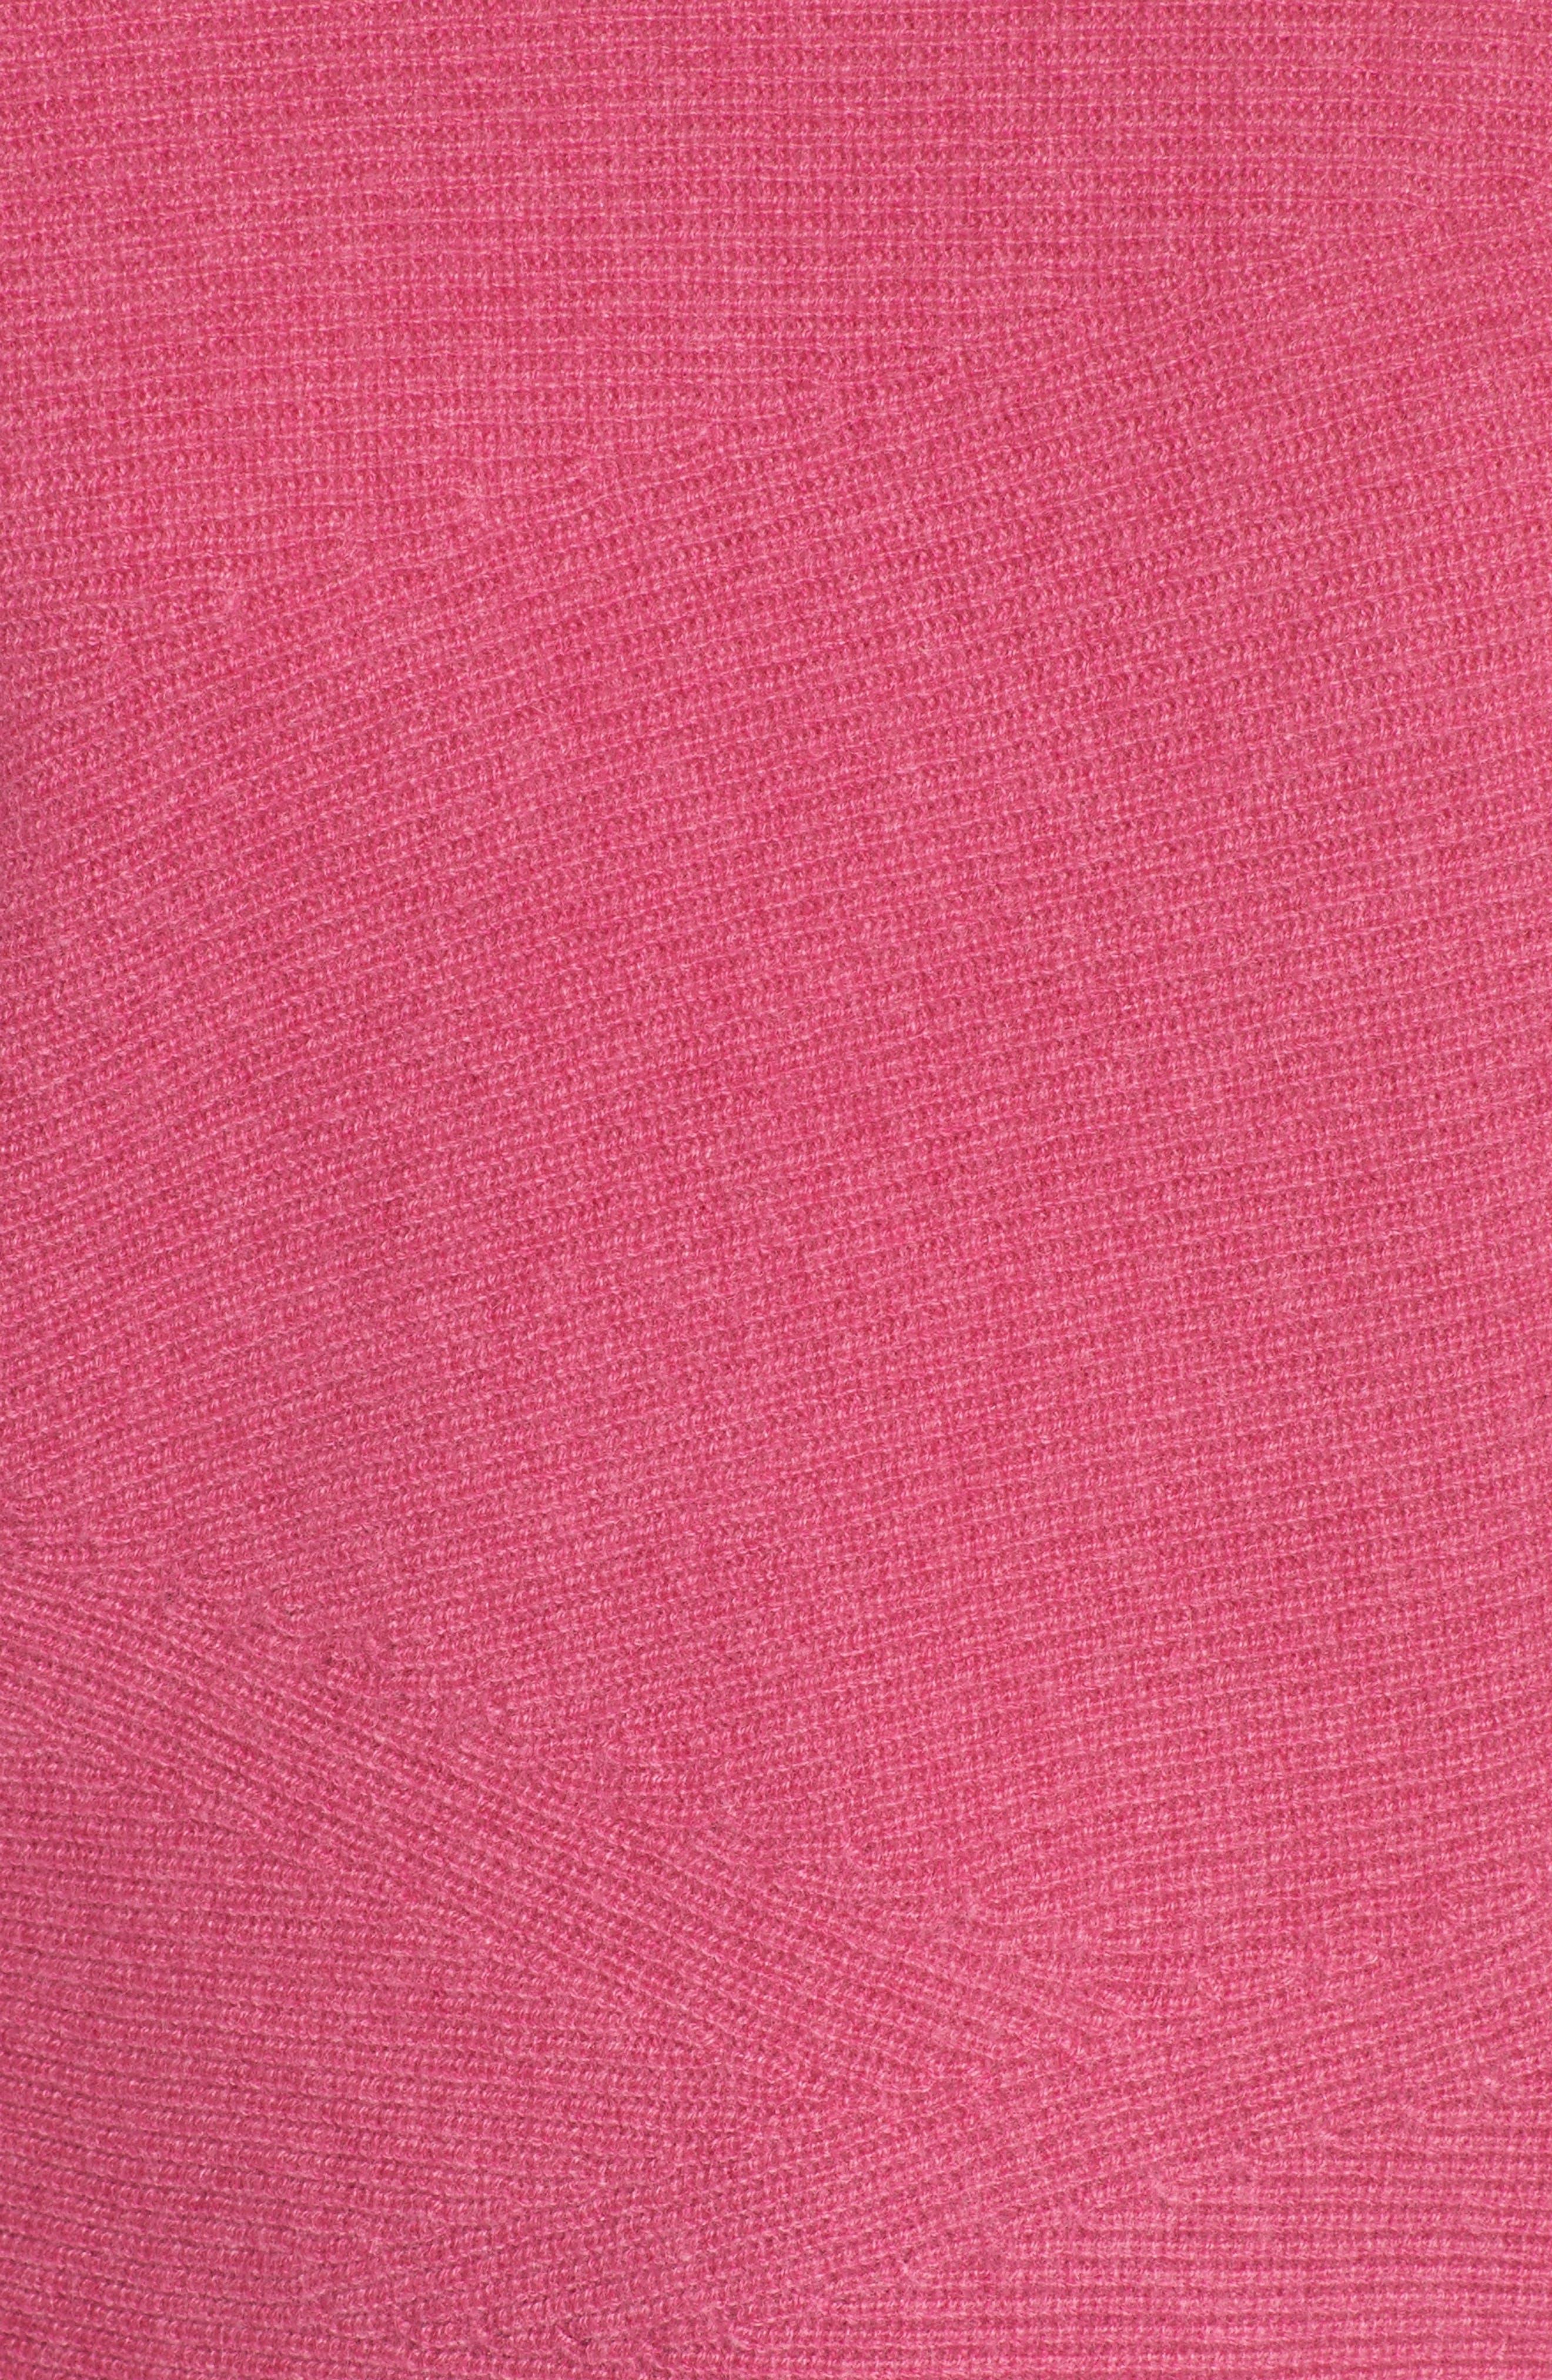 Dolman Sleeve Cashmere Sweater,                             Alternate thumbnail 10, color,